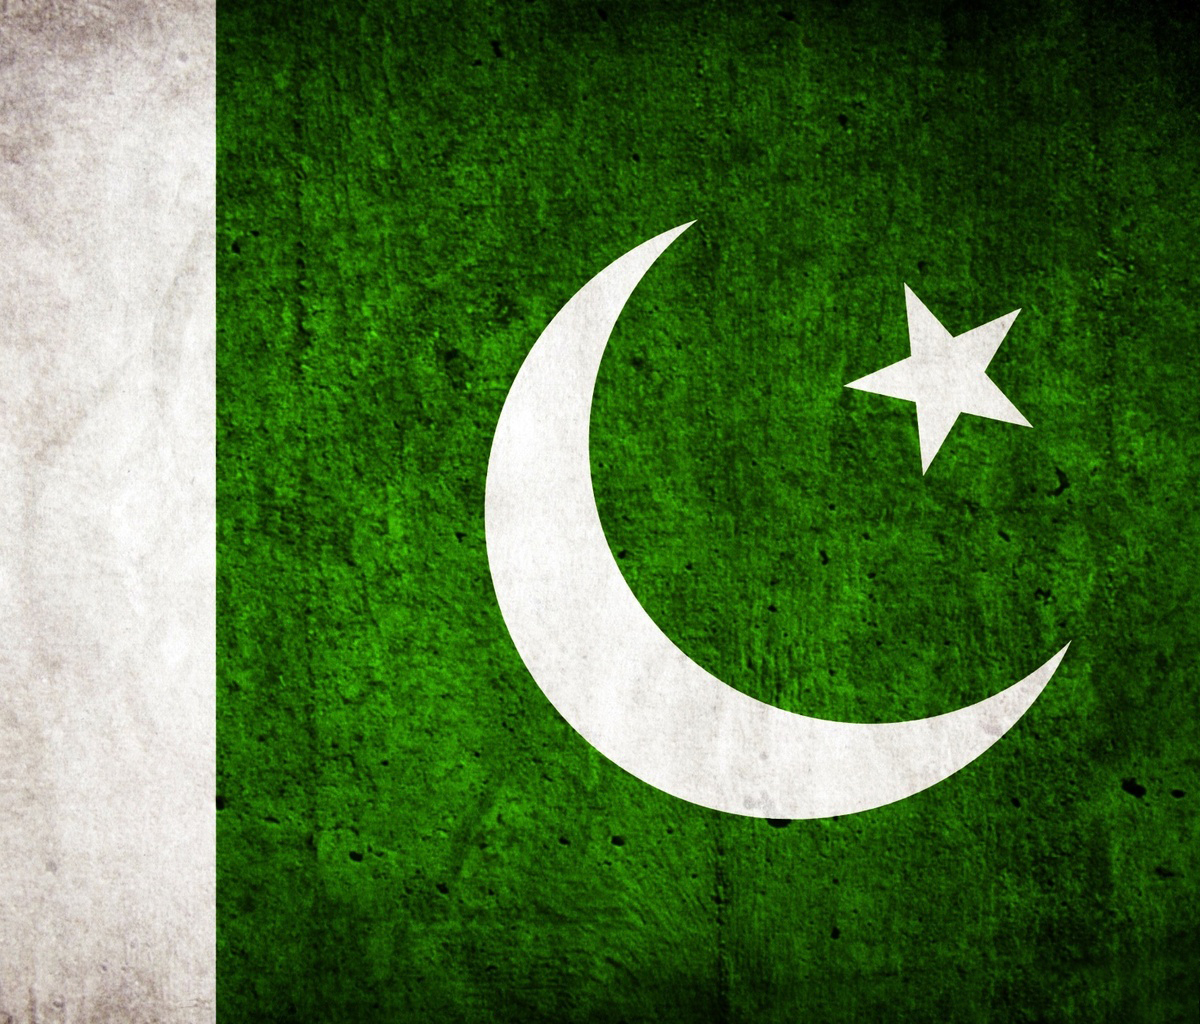 pakistan flag hd wallpapers - photo #47